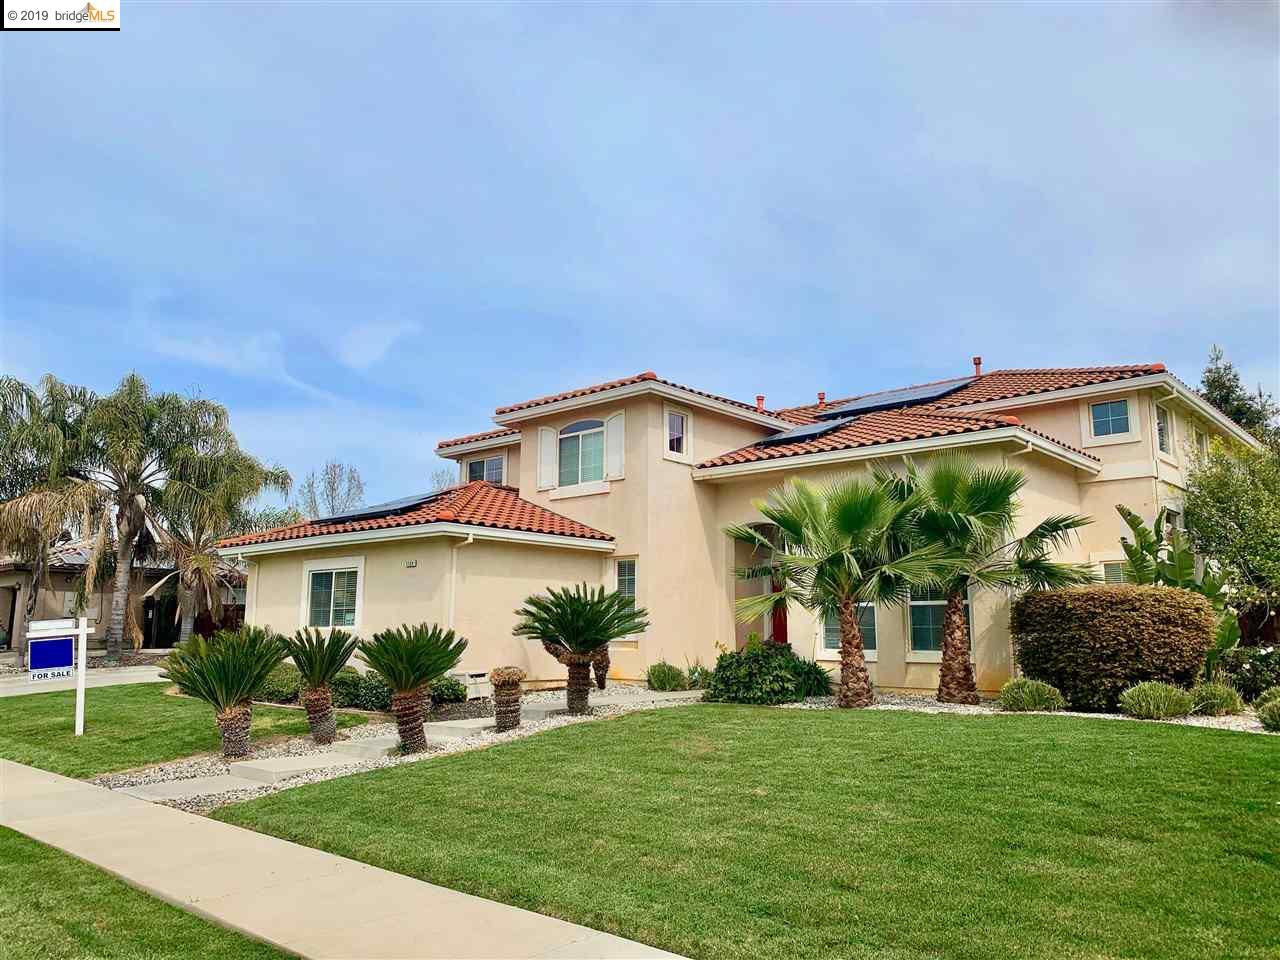 Brentwood, CA Homes for Sale | J Rockcliff